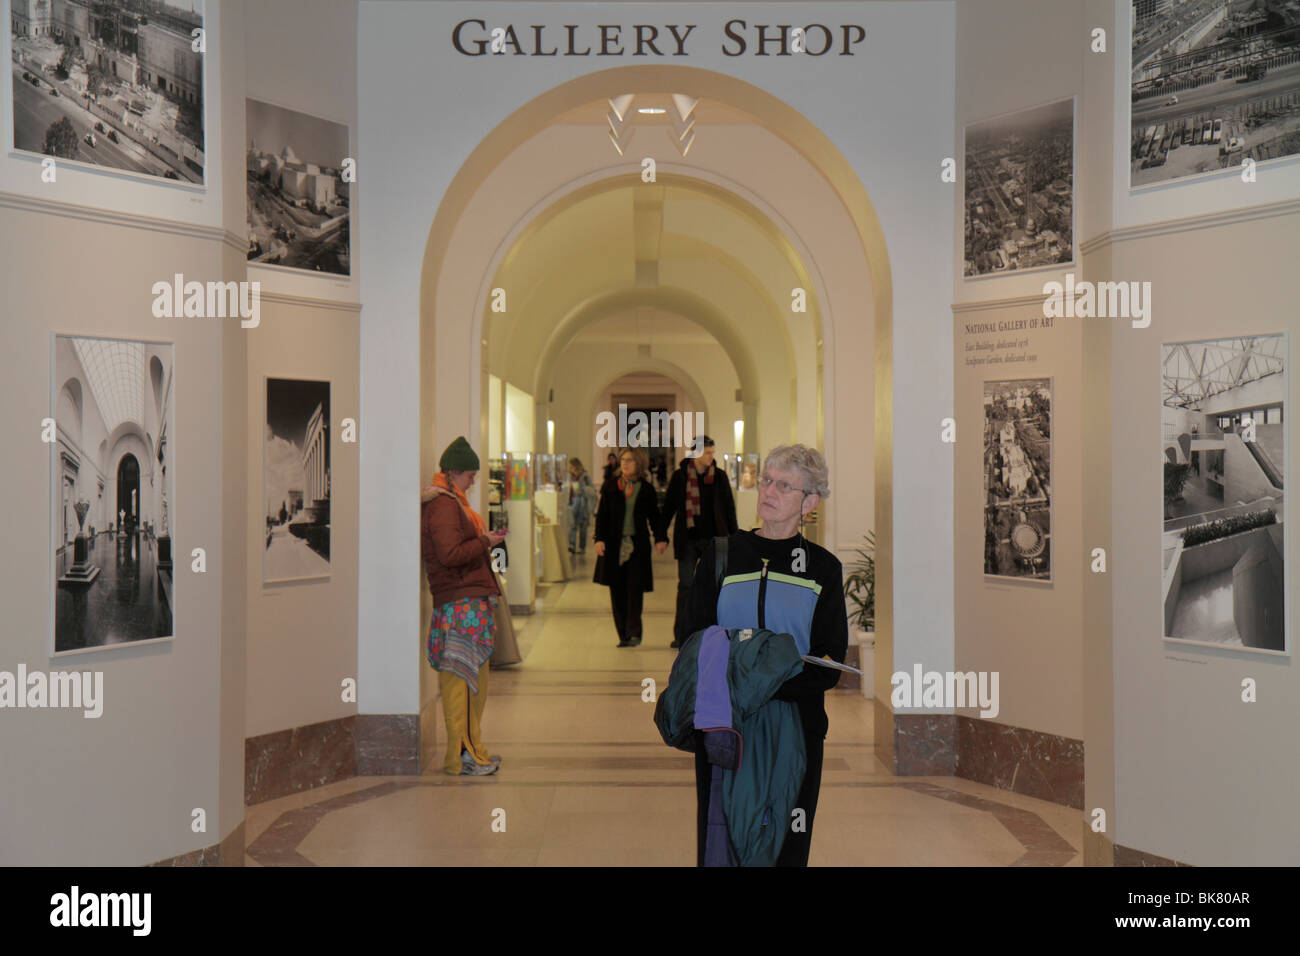 Art Gallery Gift Shop In Stockfotos & Art Gallery Gift Shop In ...